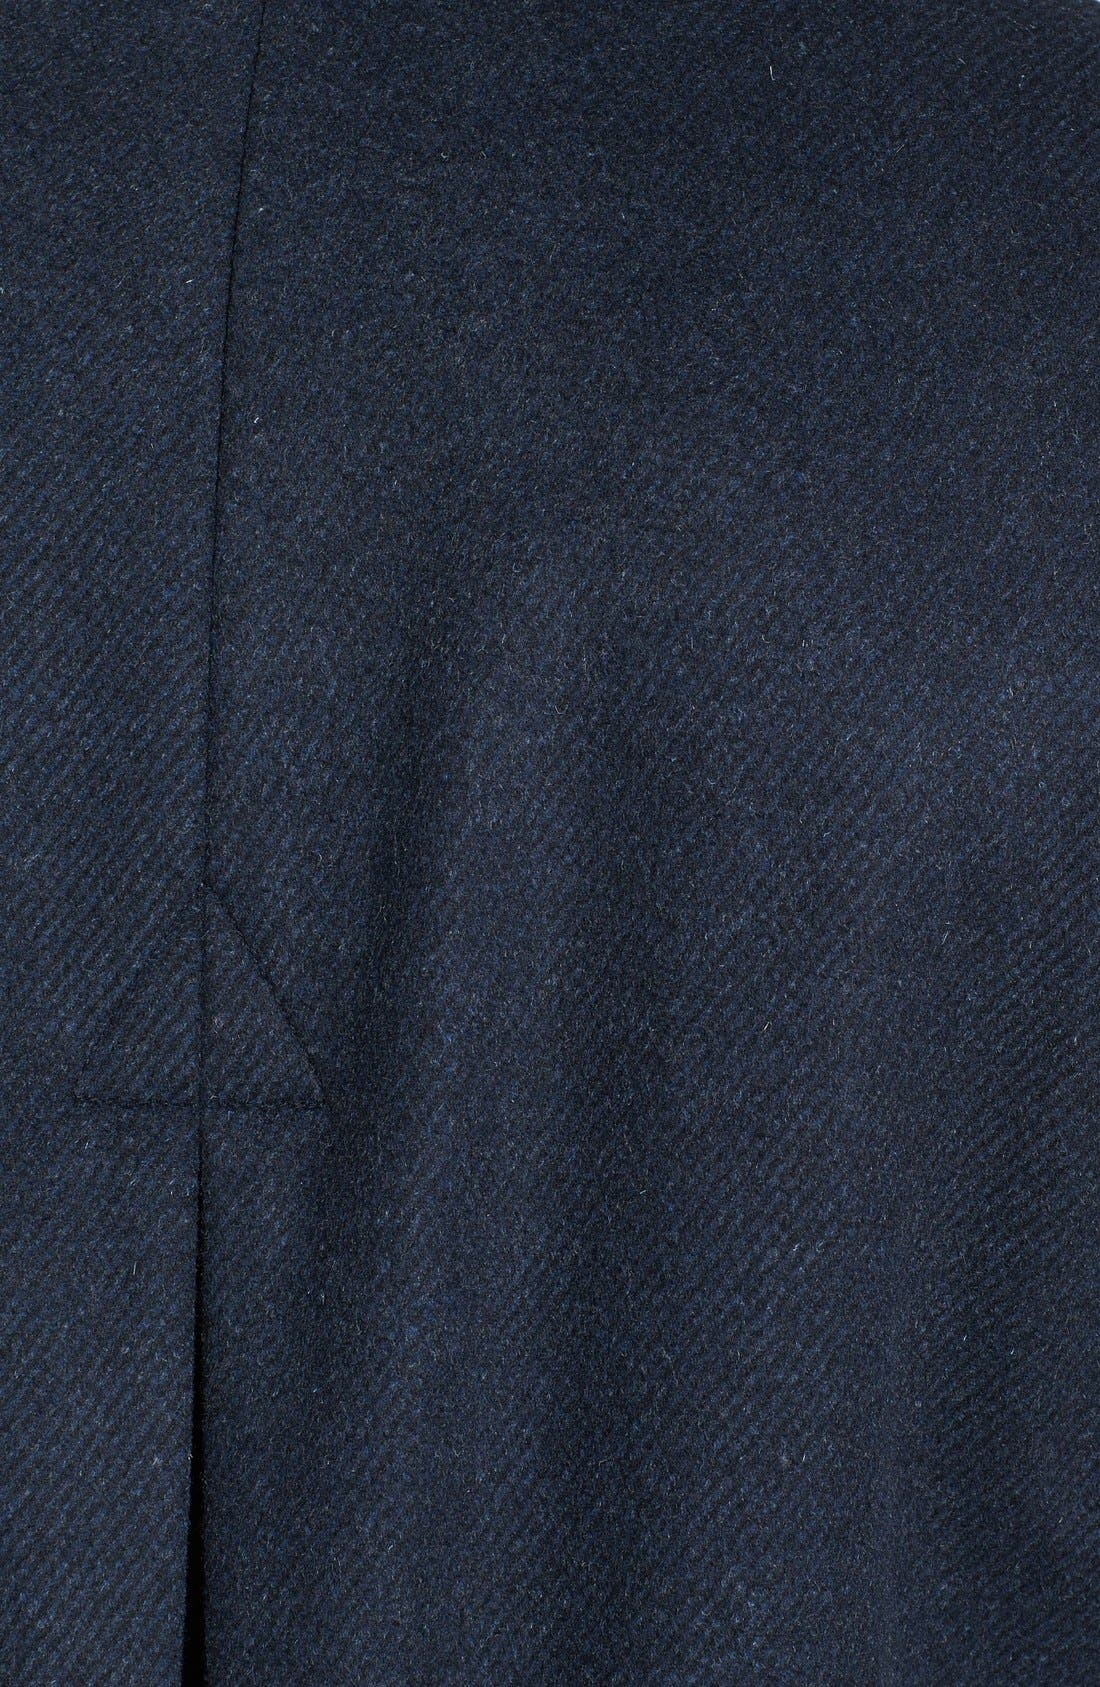 Alternate Image 3  - Cardinal of Canada Wool Blend Top Coat